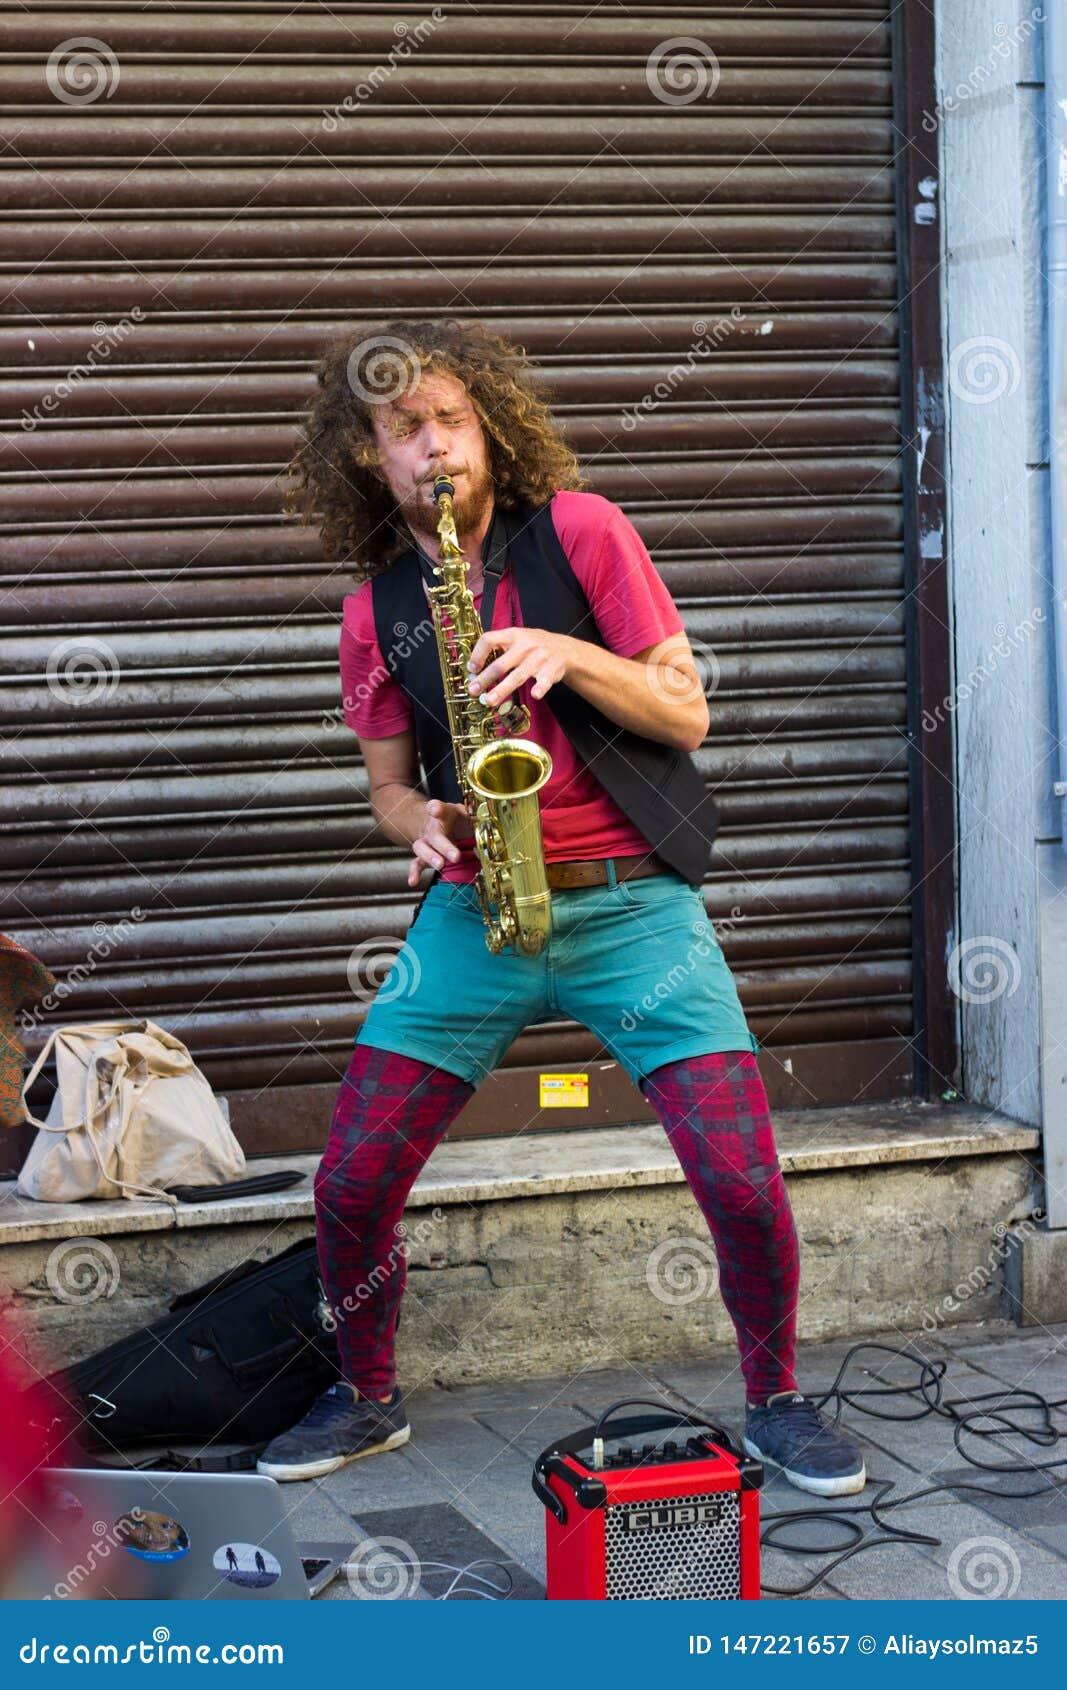 Istanbul, Istiklal Street / Turkey 9.5.2019: Street Musician Performing Saxophone in the Istiklal Street